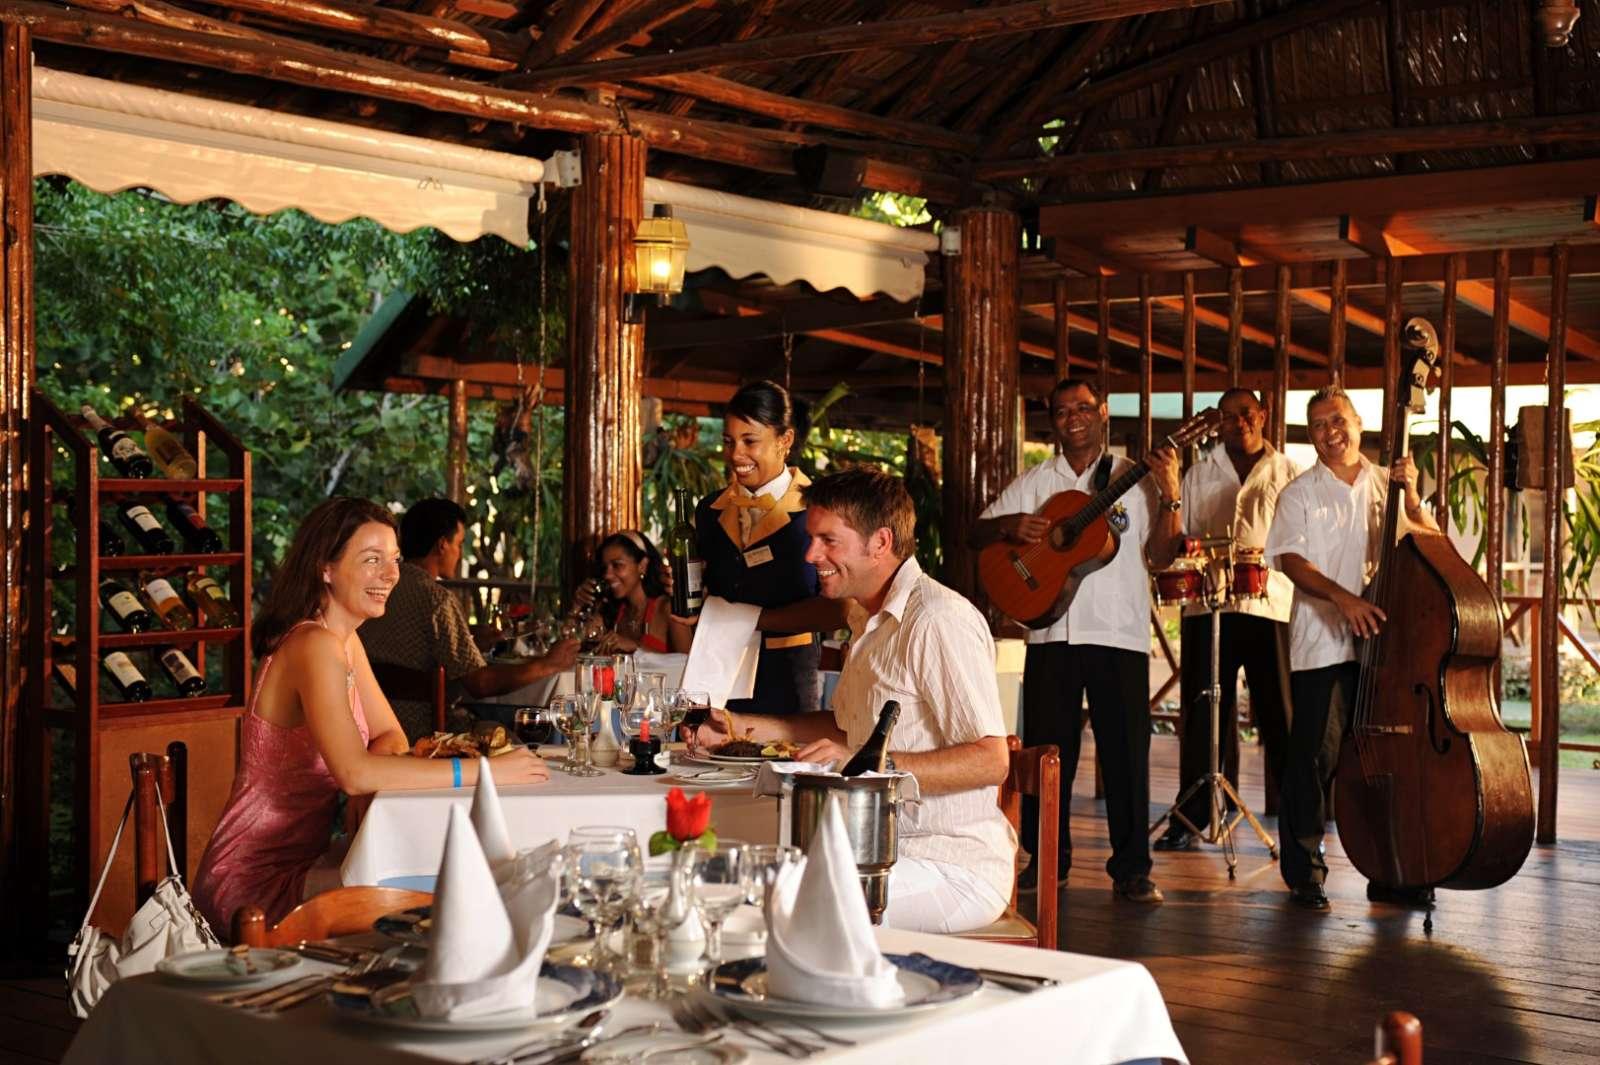 Iberostar Tainos restaurant with live music